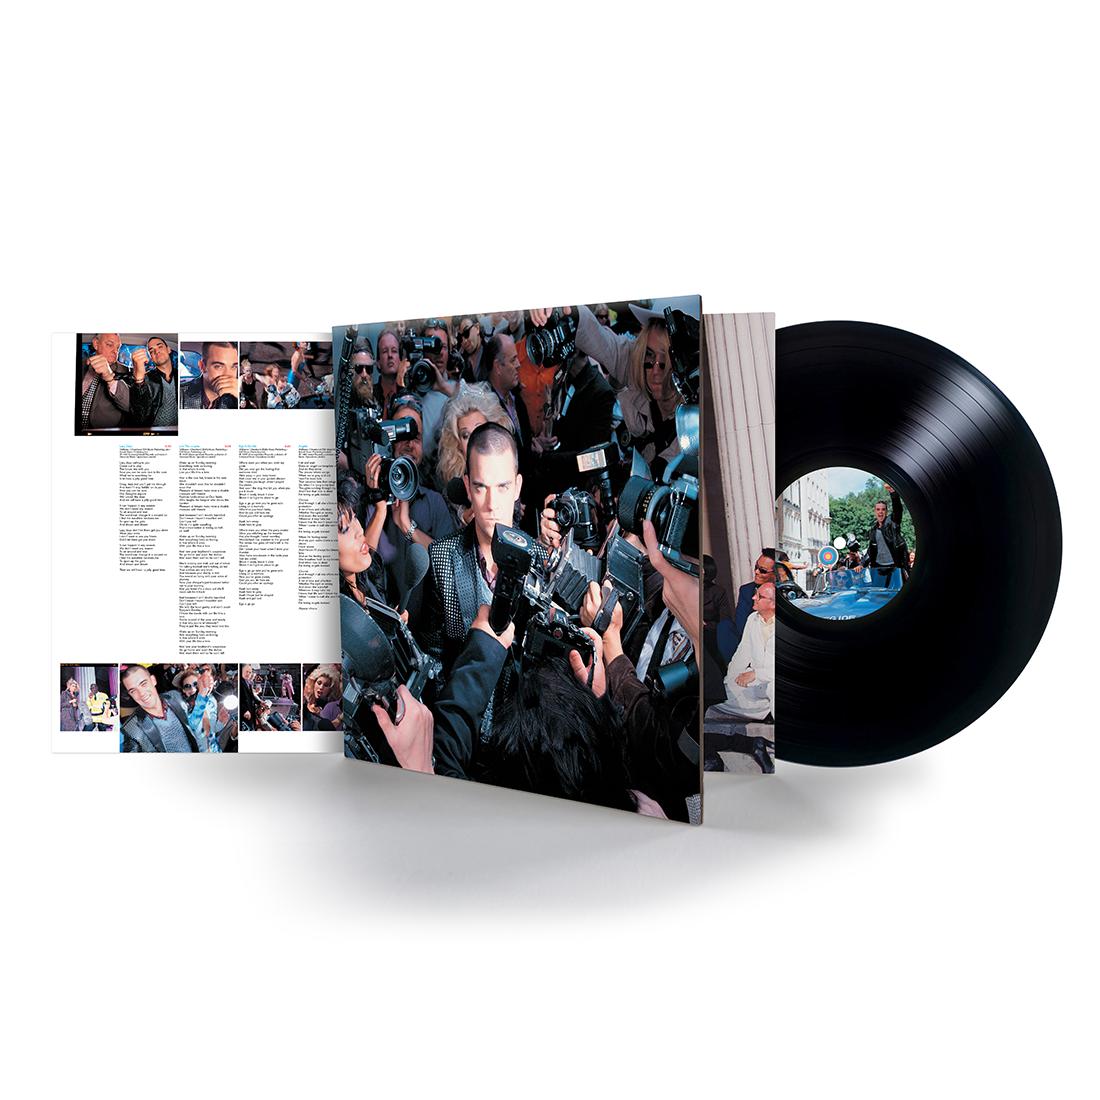 Life Thru A Lens: Vinyl Reissue